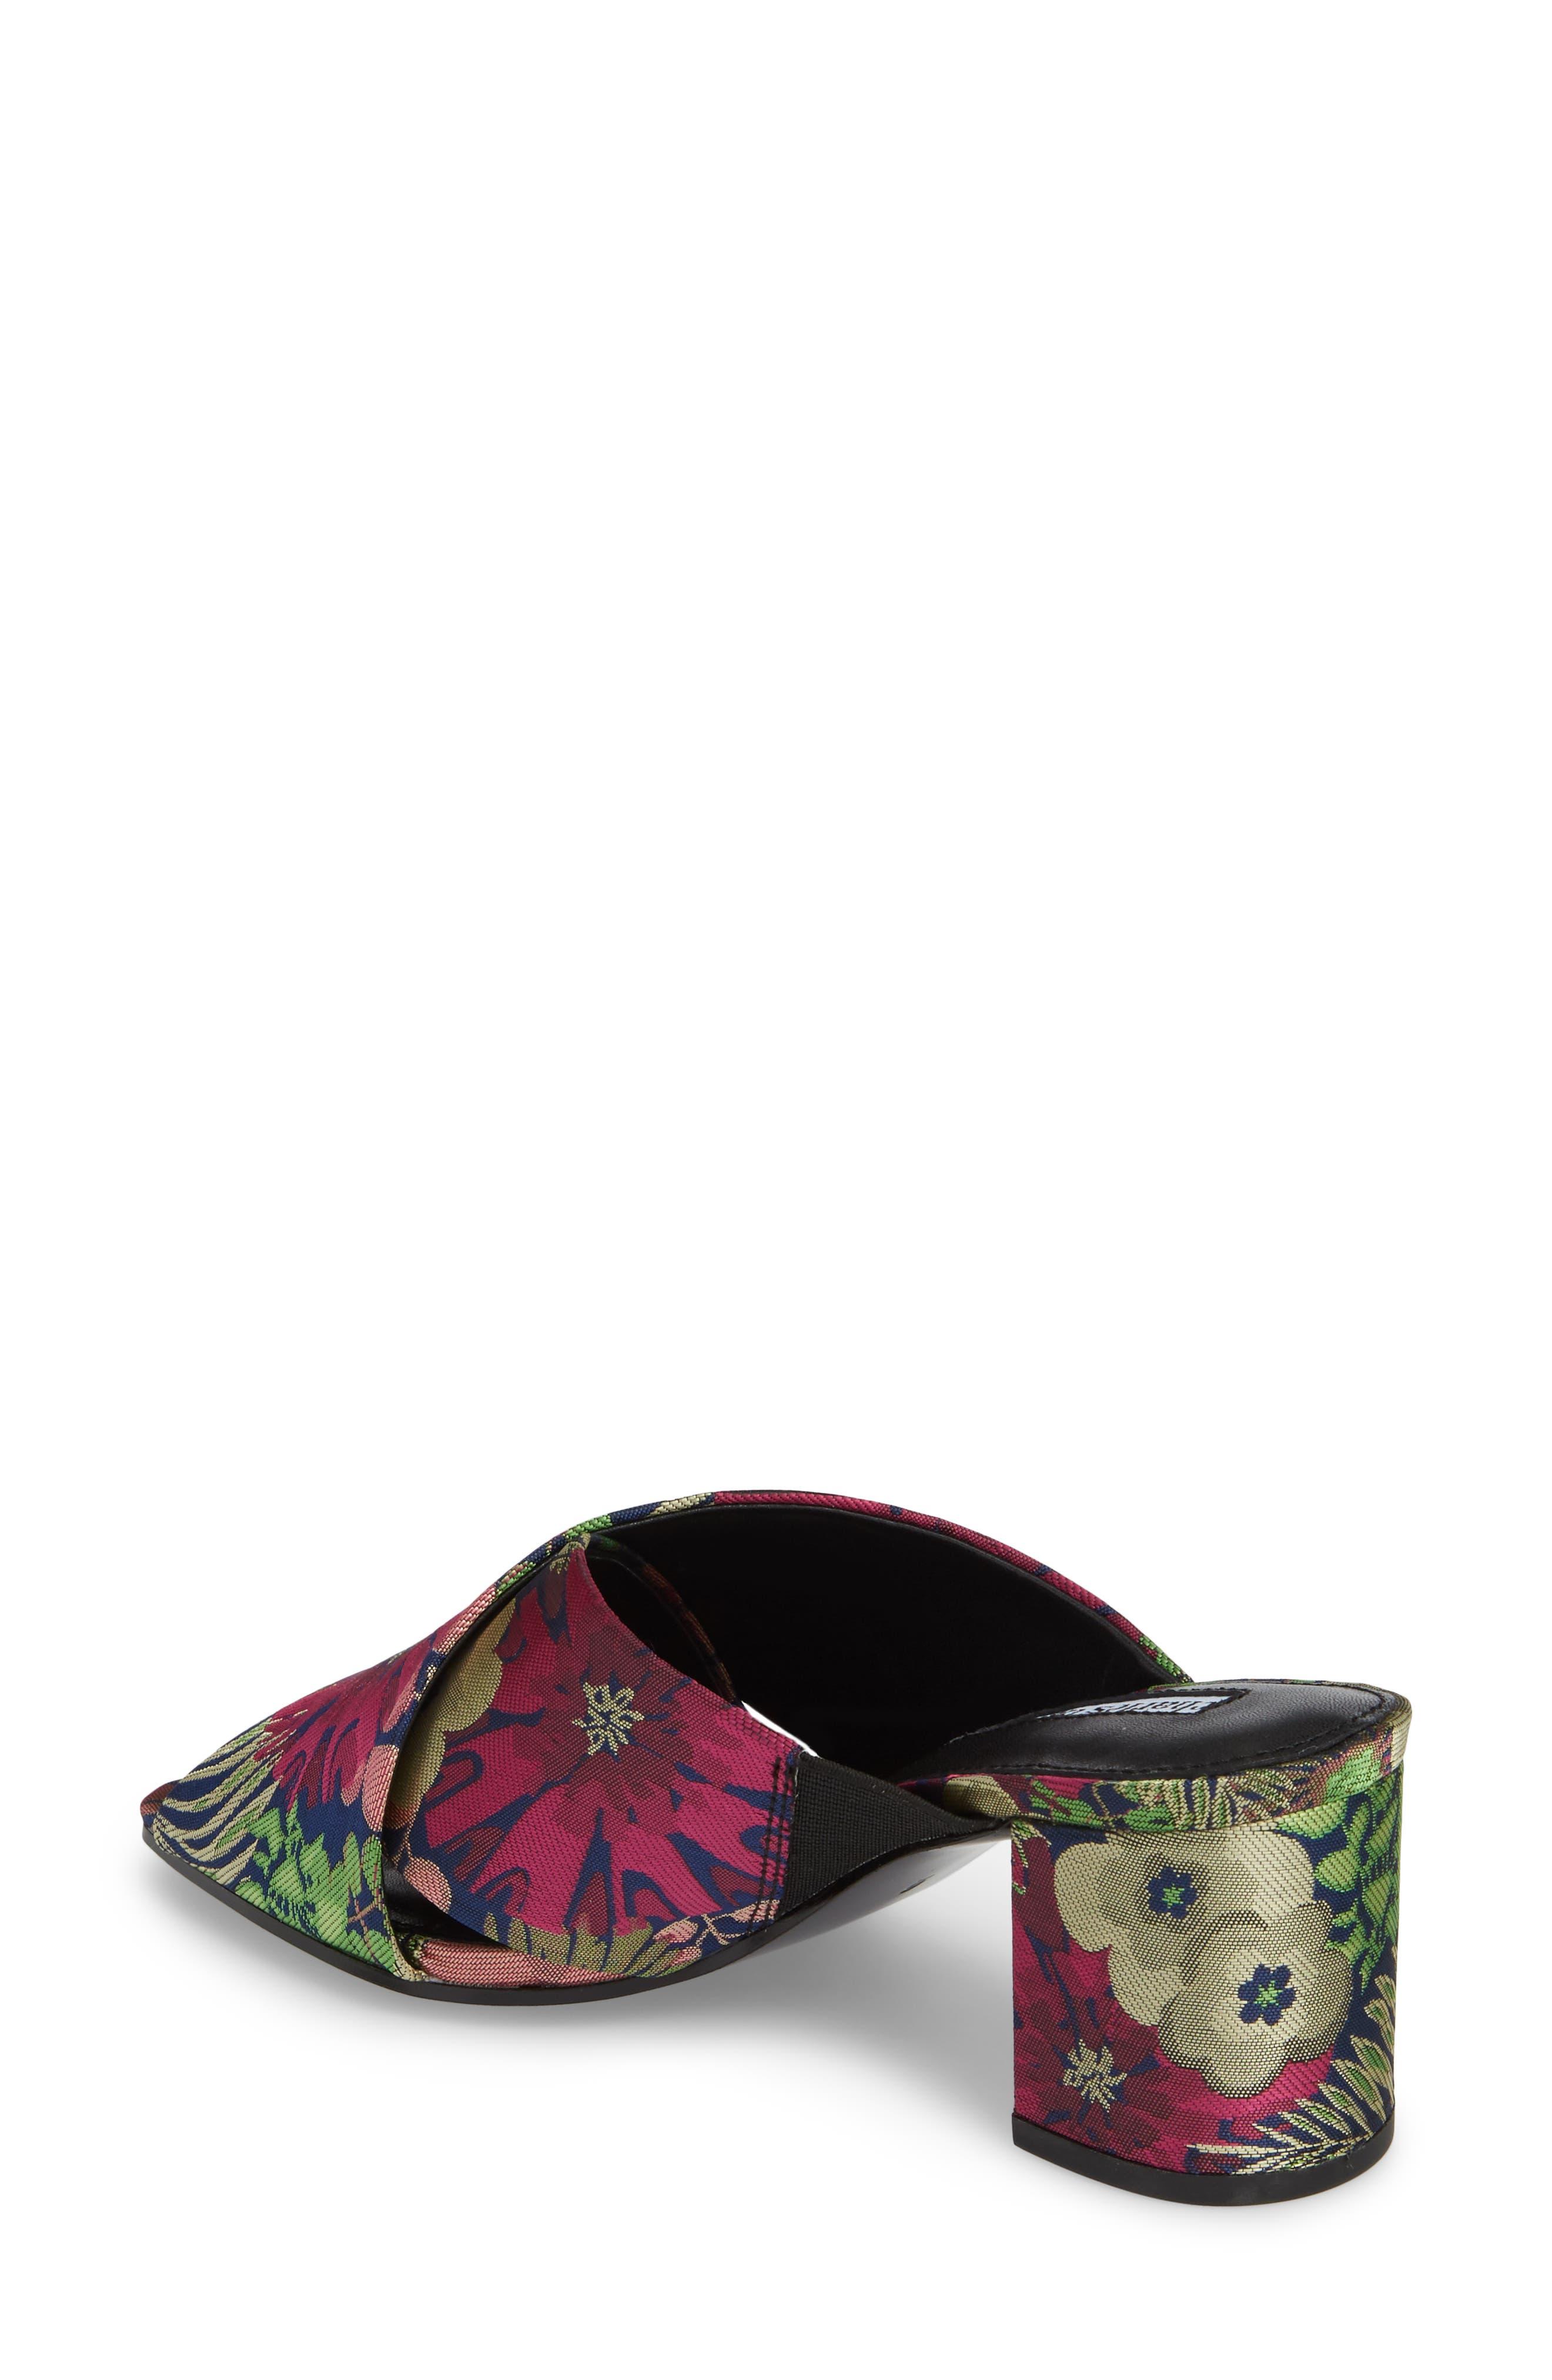 Crissaly Slide Sandal,                             Alternate thumbnail 2, color,                             GREEN MULTI FLORAL FABRIC